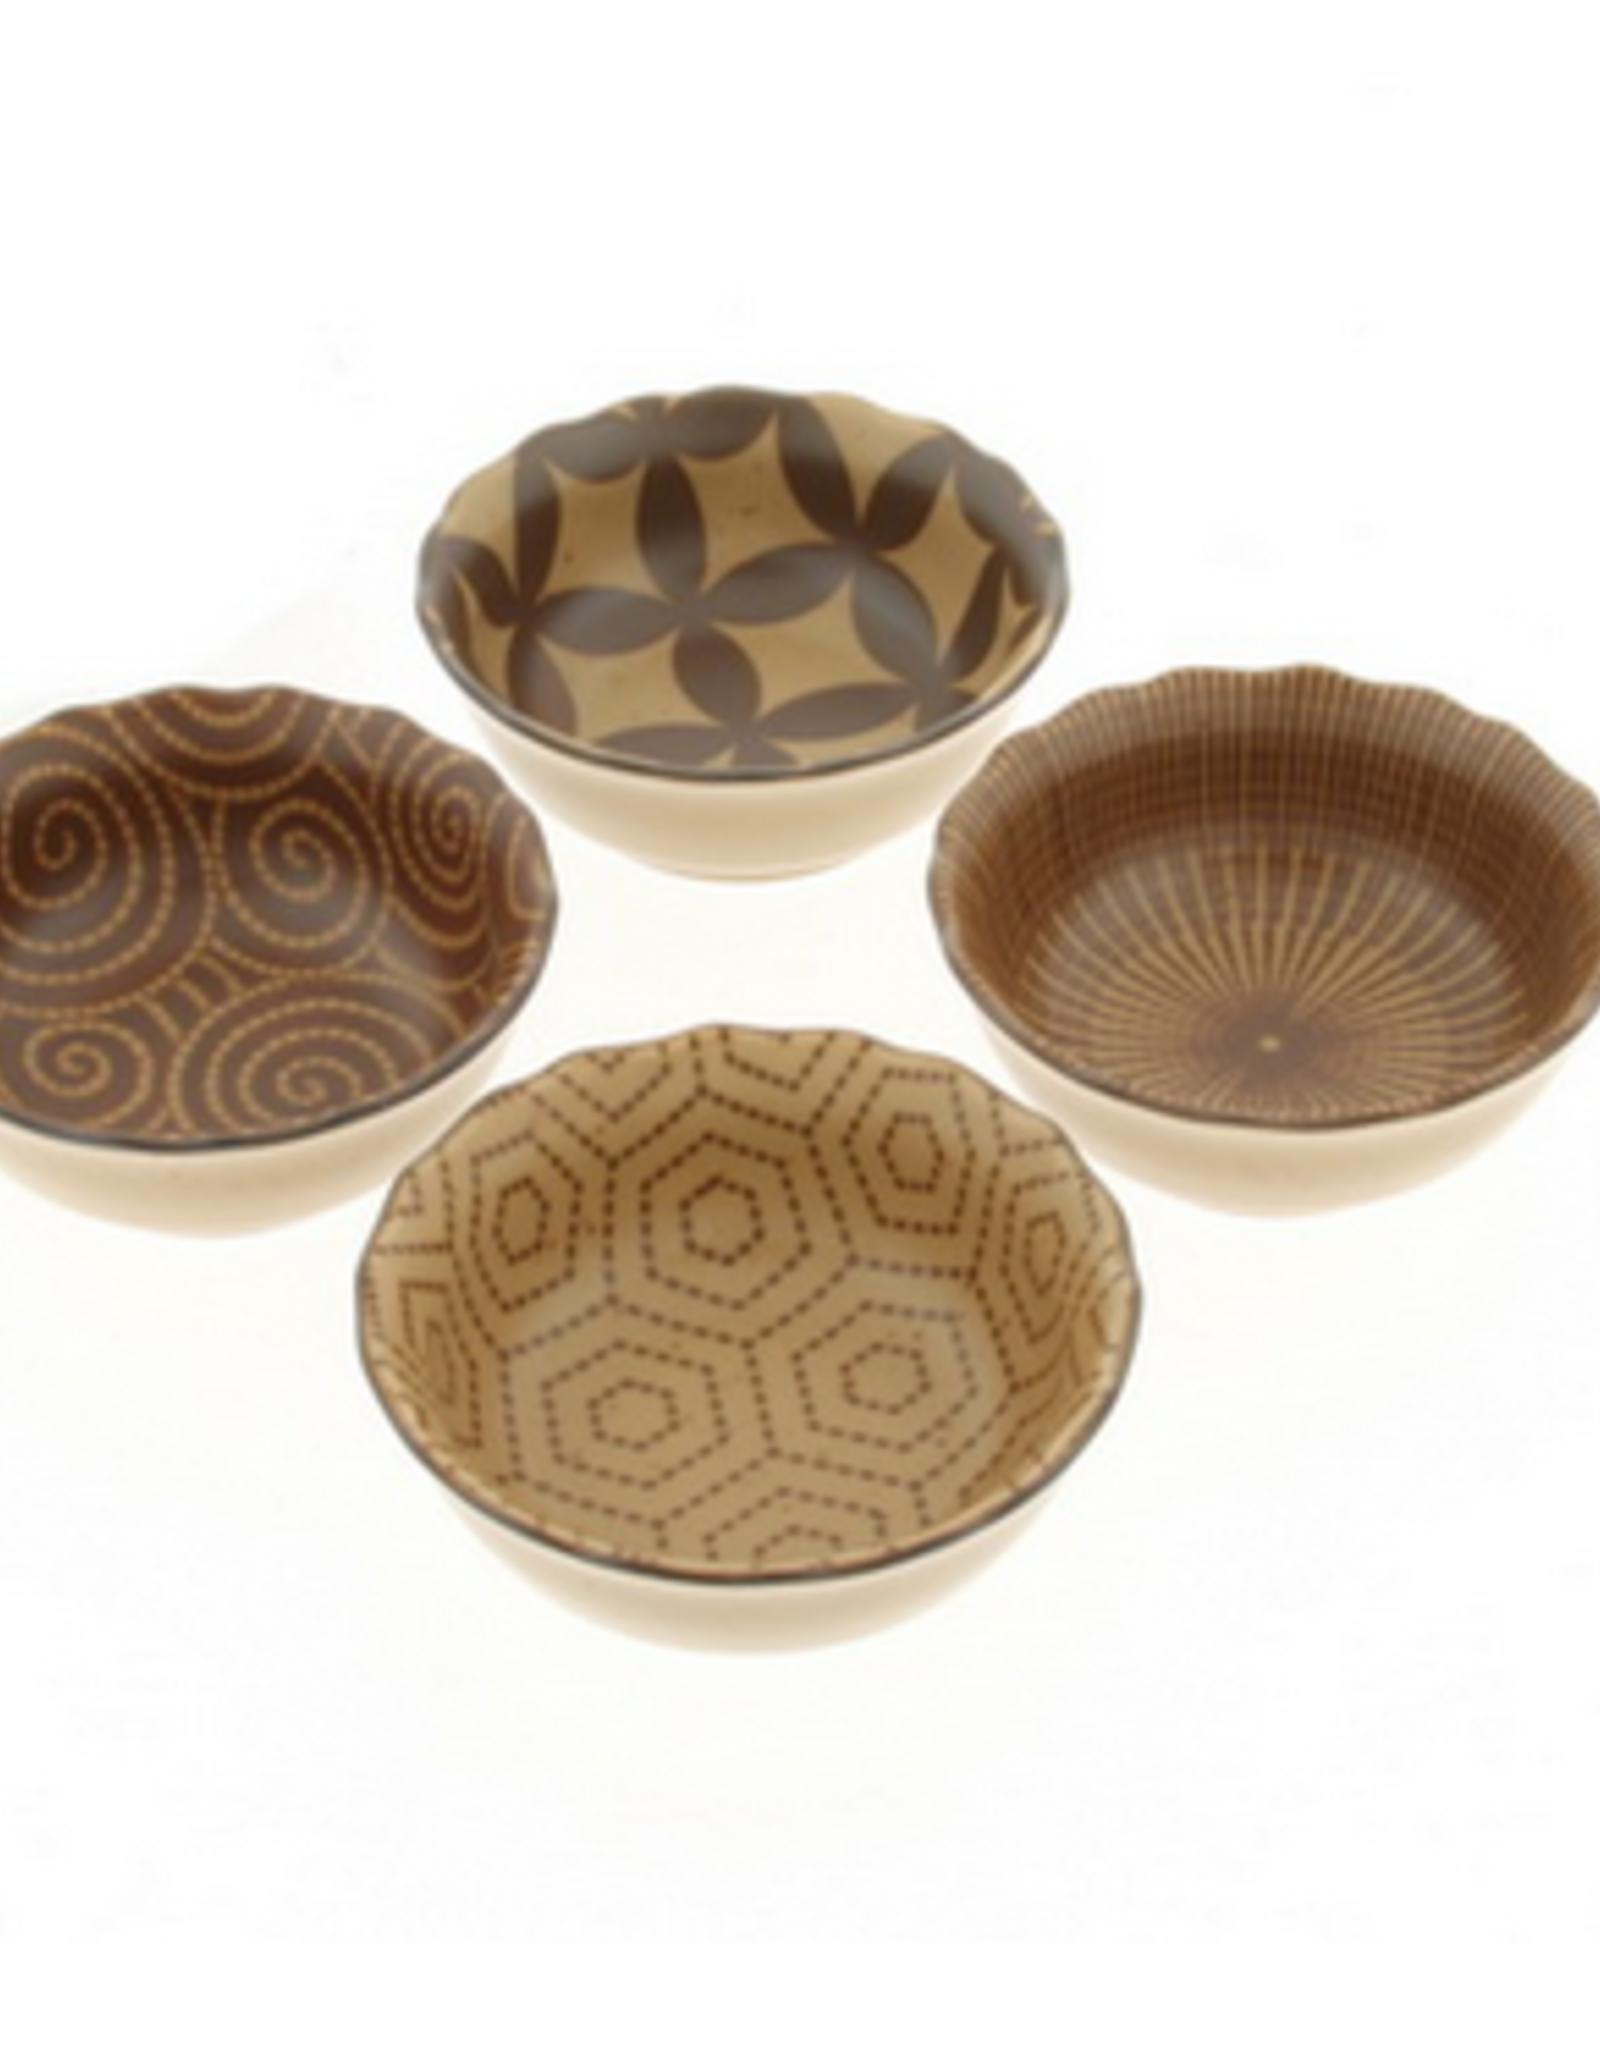 Kyo Modern Sepia Sauce Bowl Set of 4